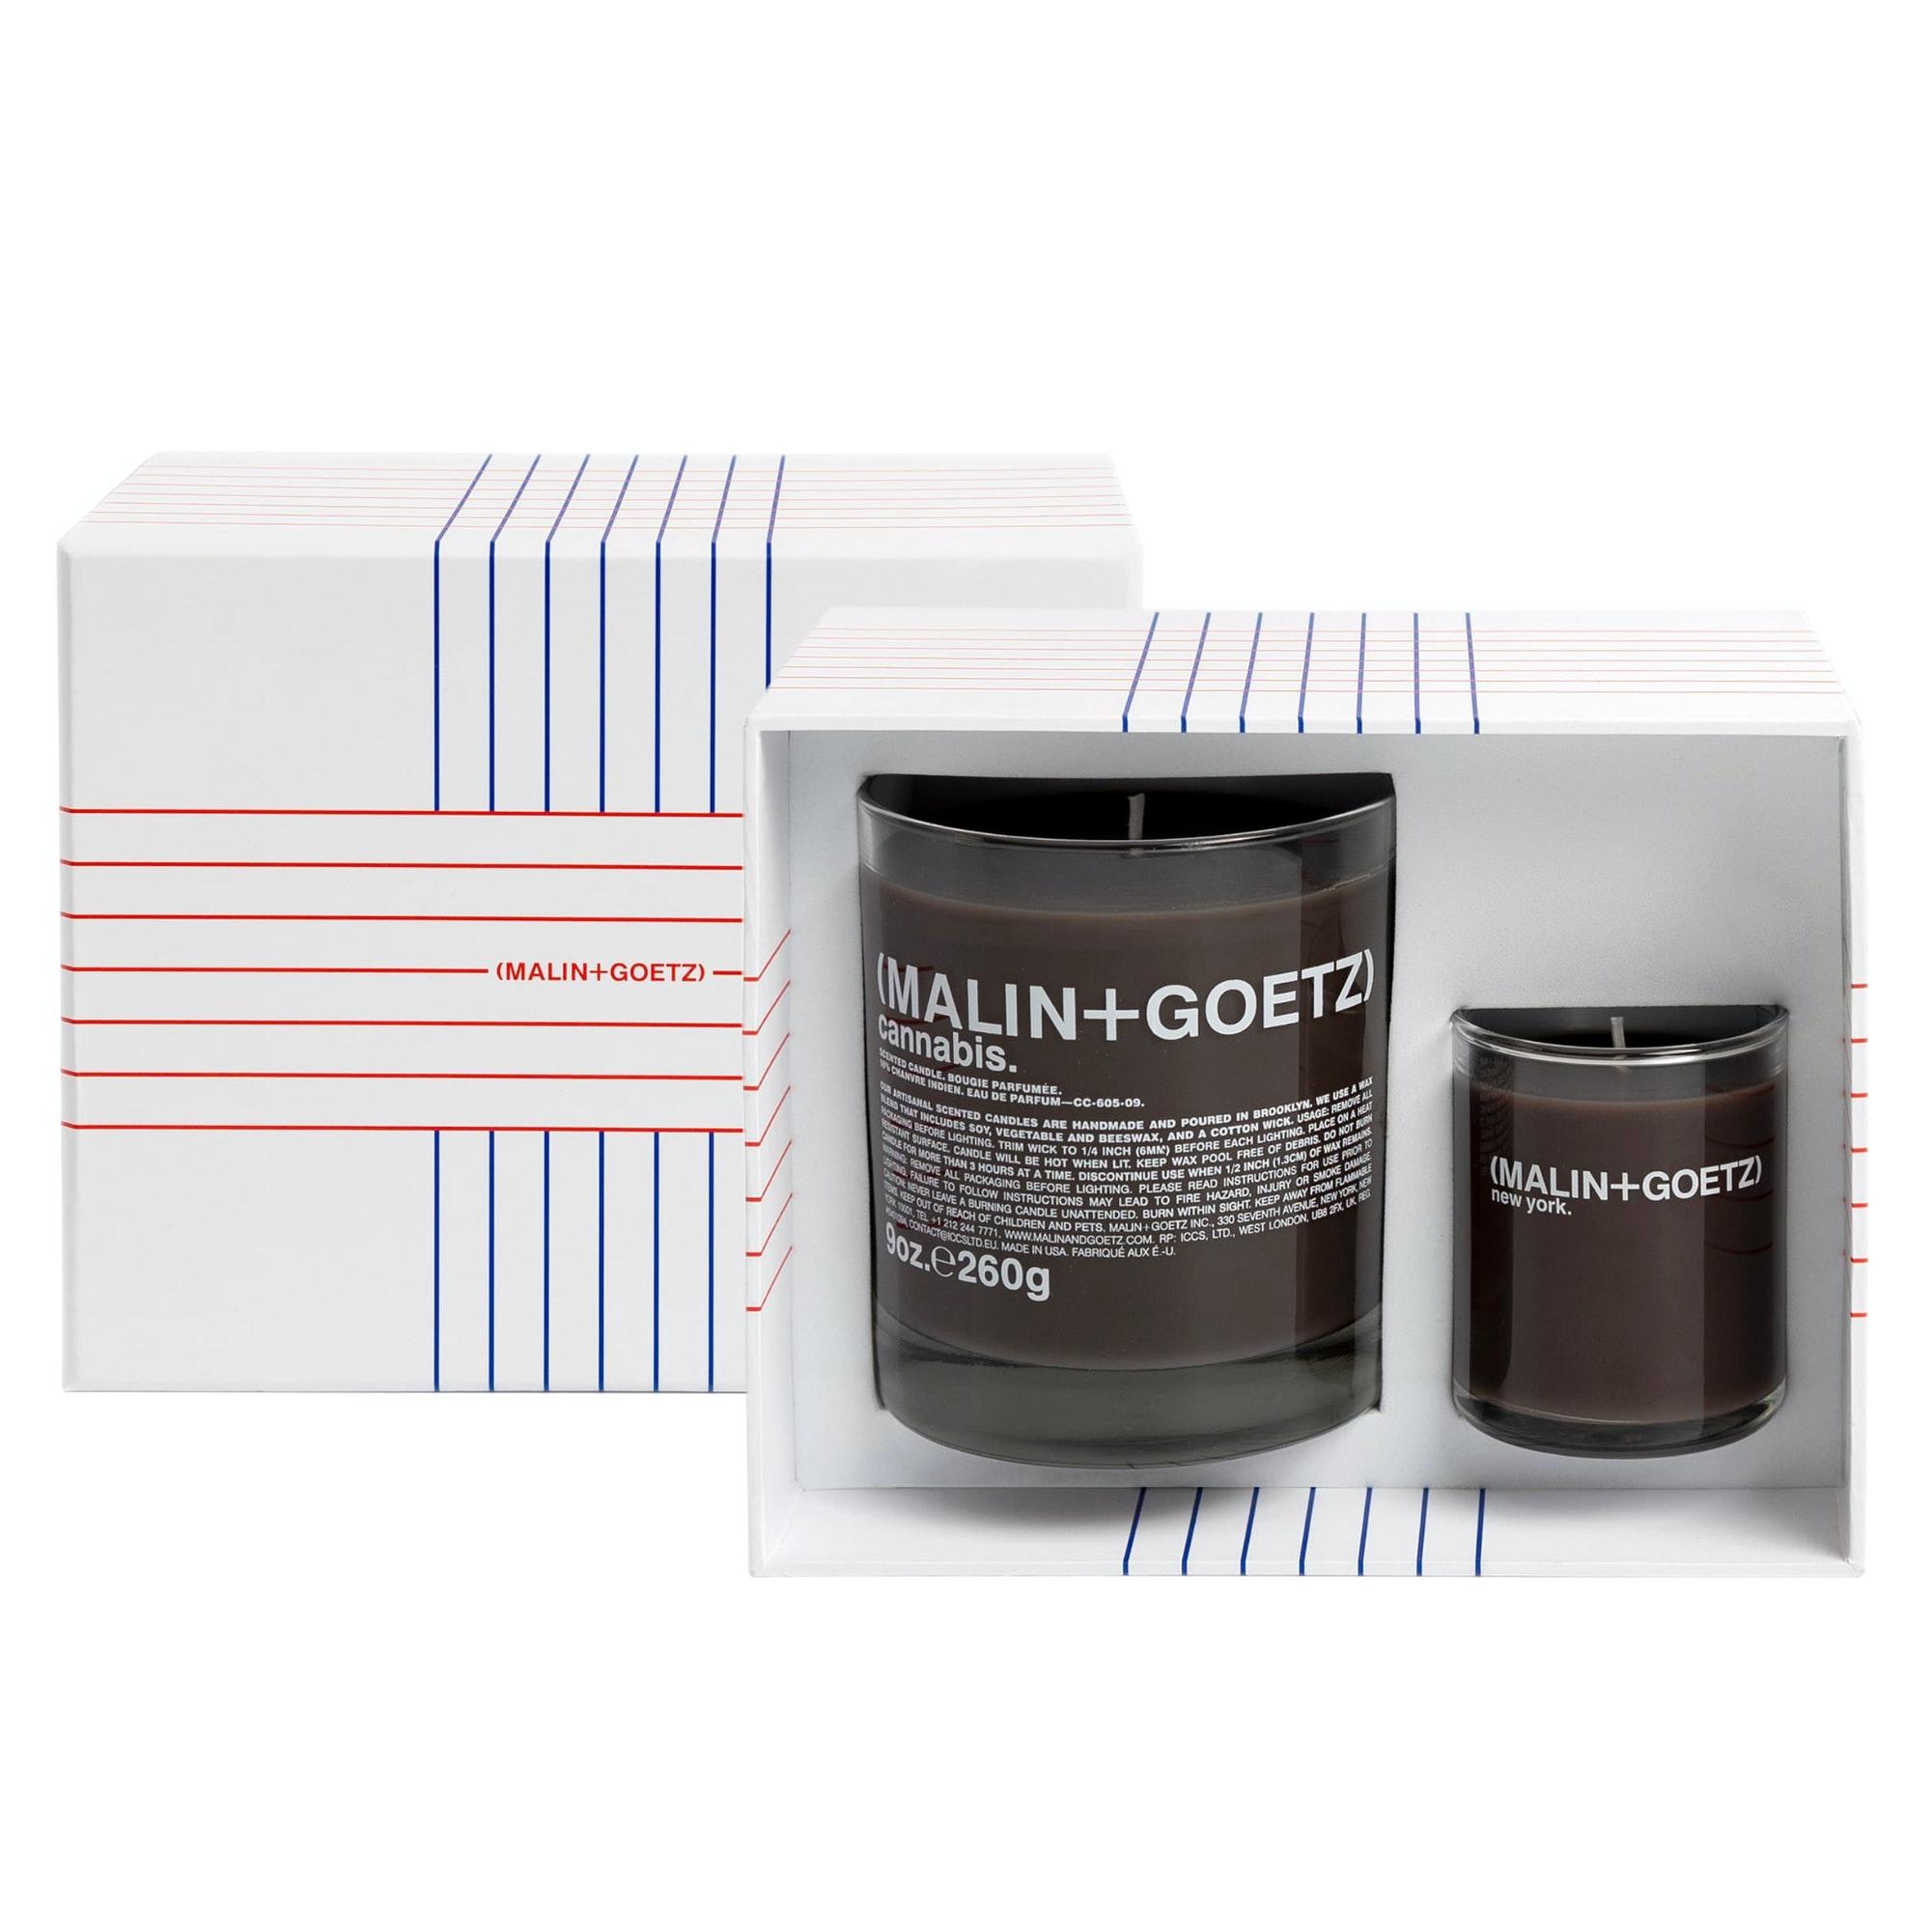 (Malin + Goetz) Get Lit Cannabis Candle Set